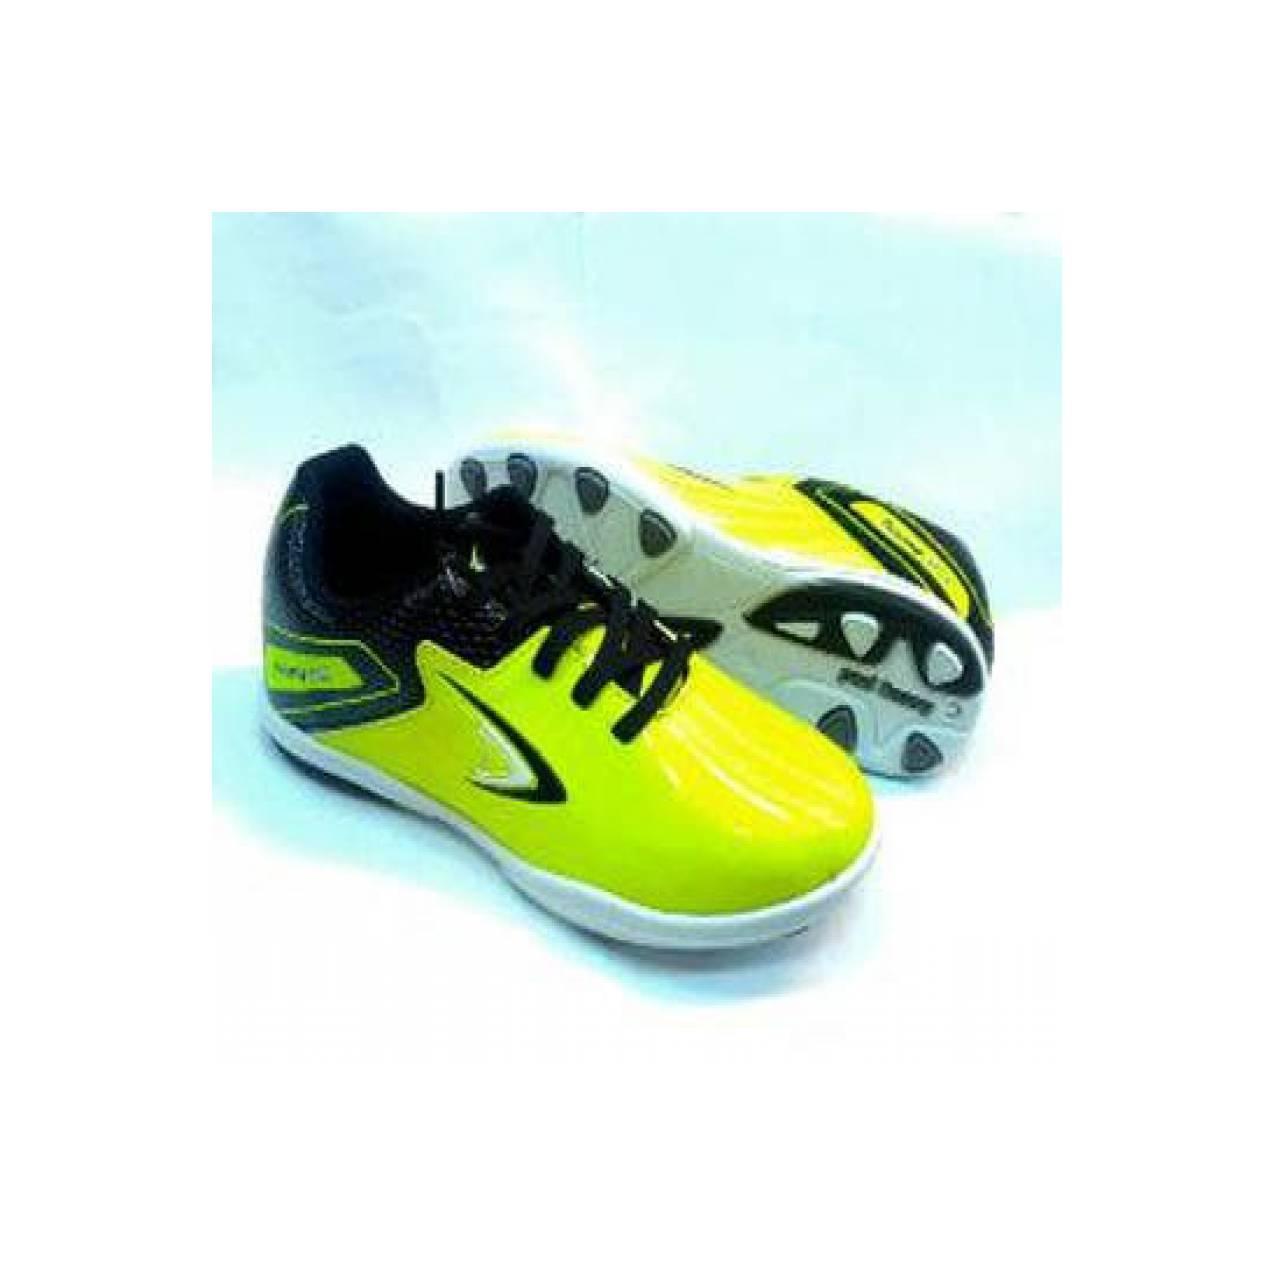 Sepatu futsal anak Homyped Guardiola neon black Berkualitas